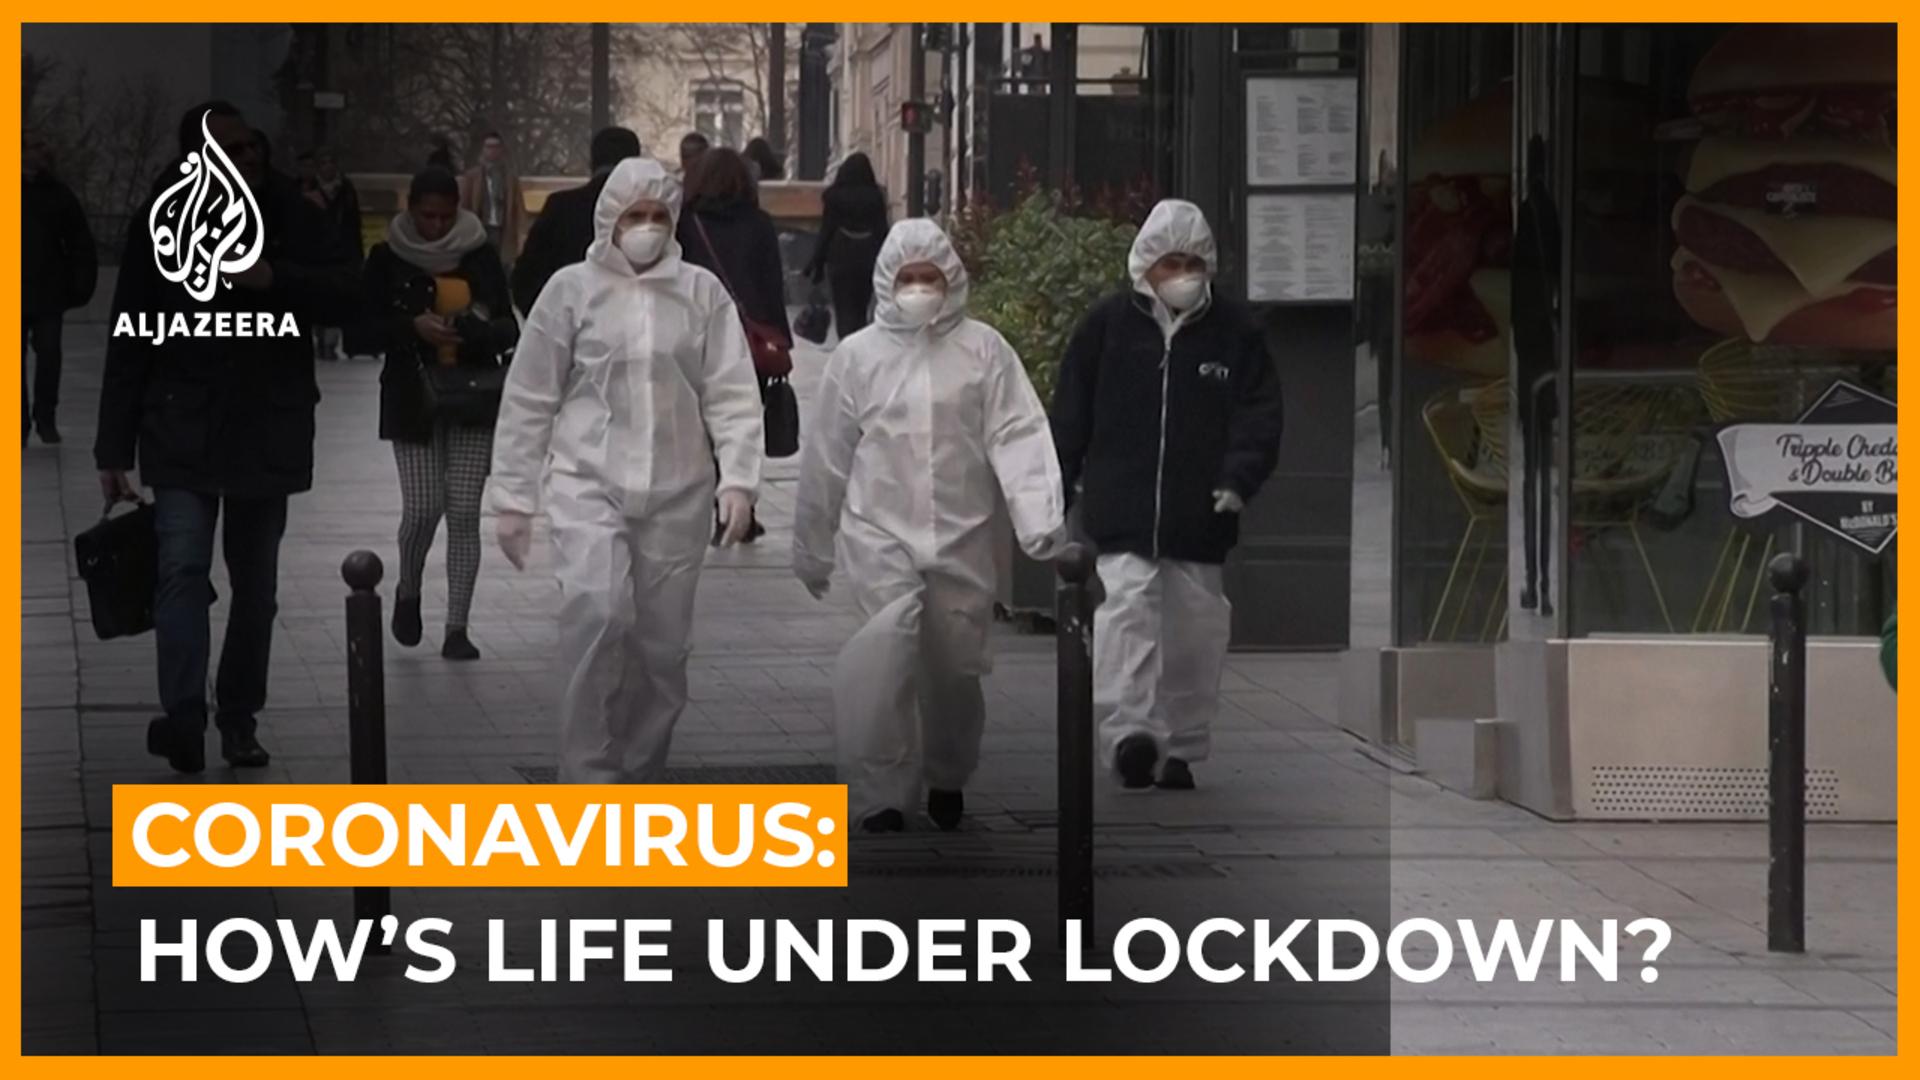 Egypt Targets Guardian Nyt Journalists Over Coronavirus Reports Coronavirus Pandemic News Al Jazeera